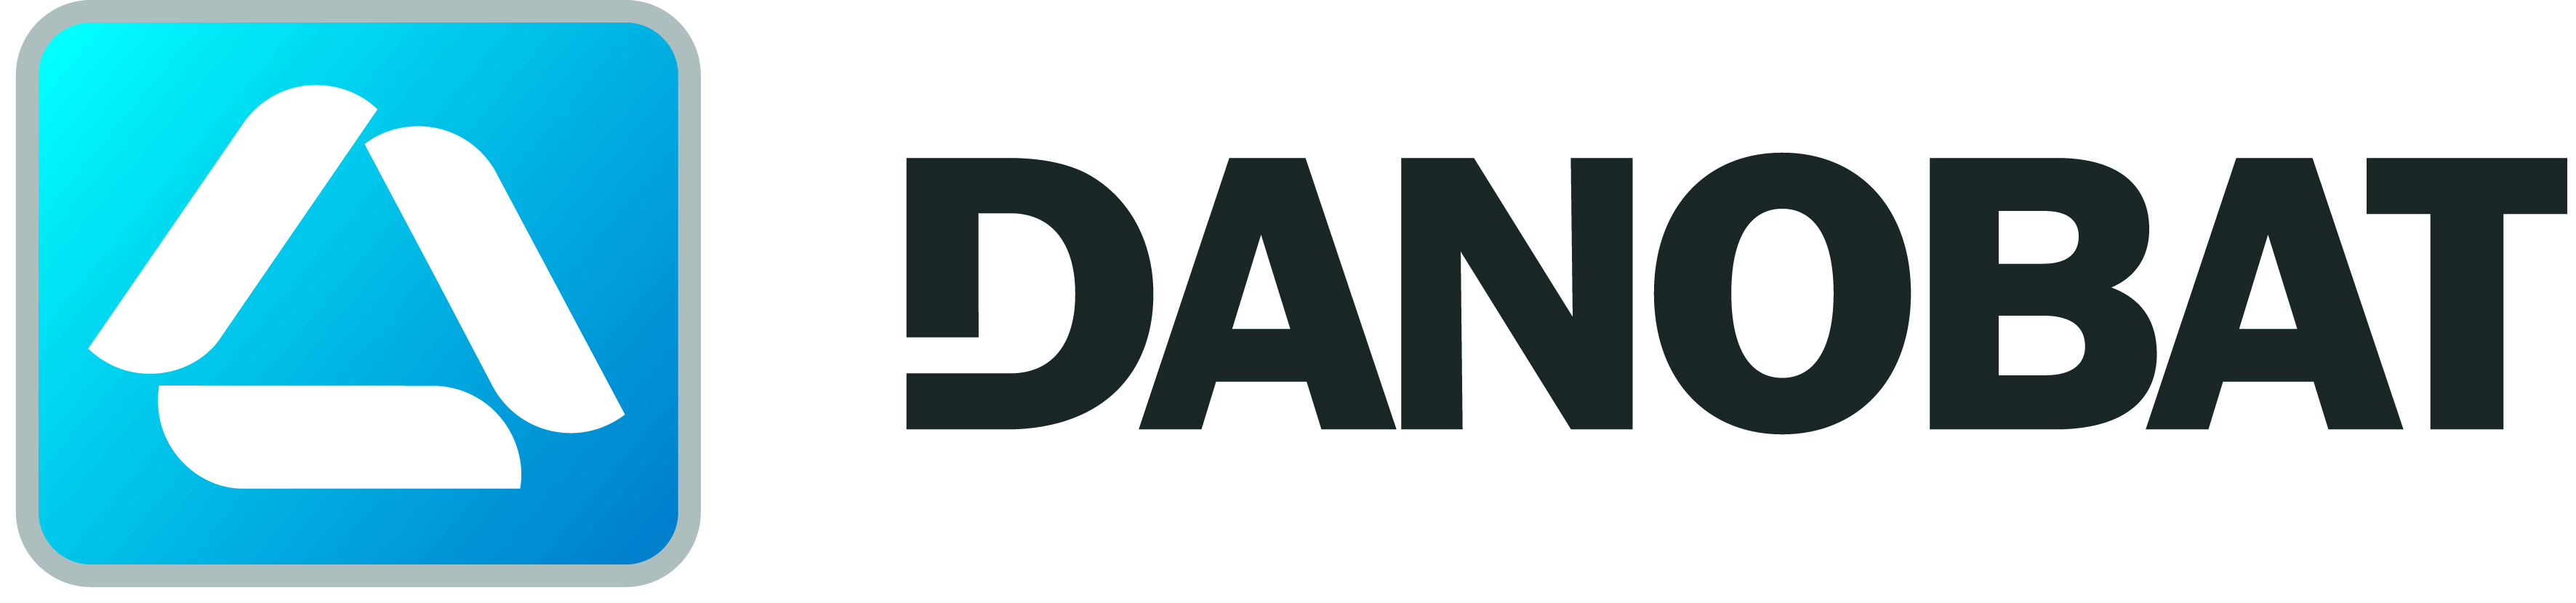 Danobat logo